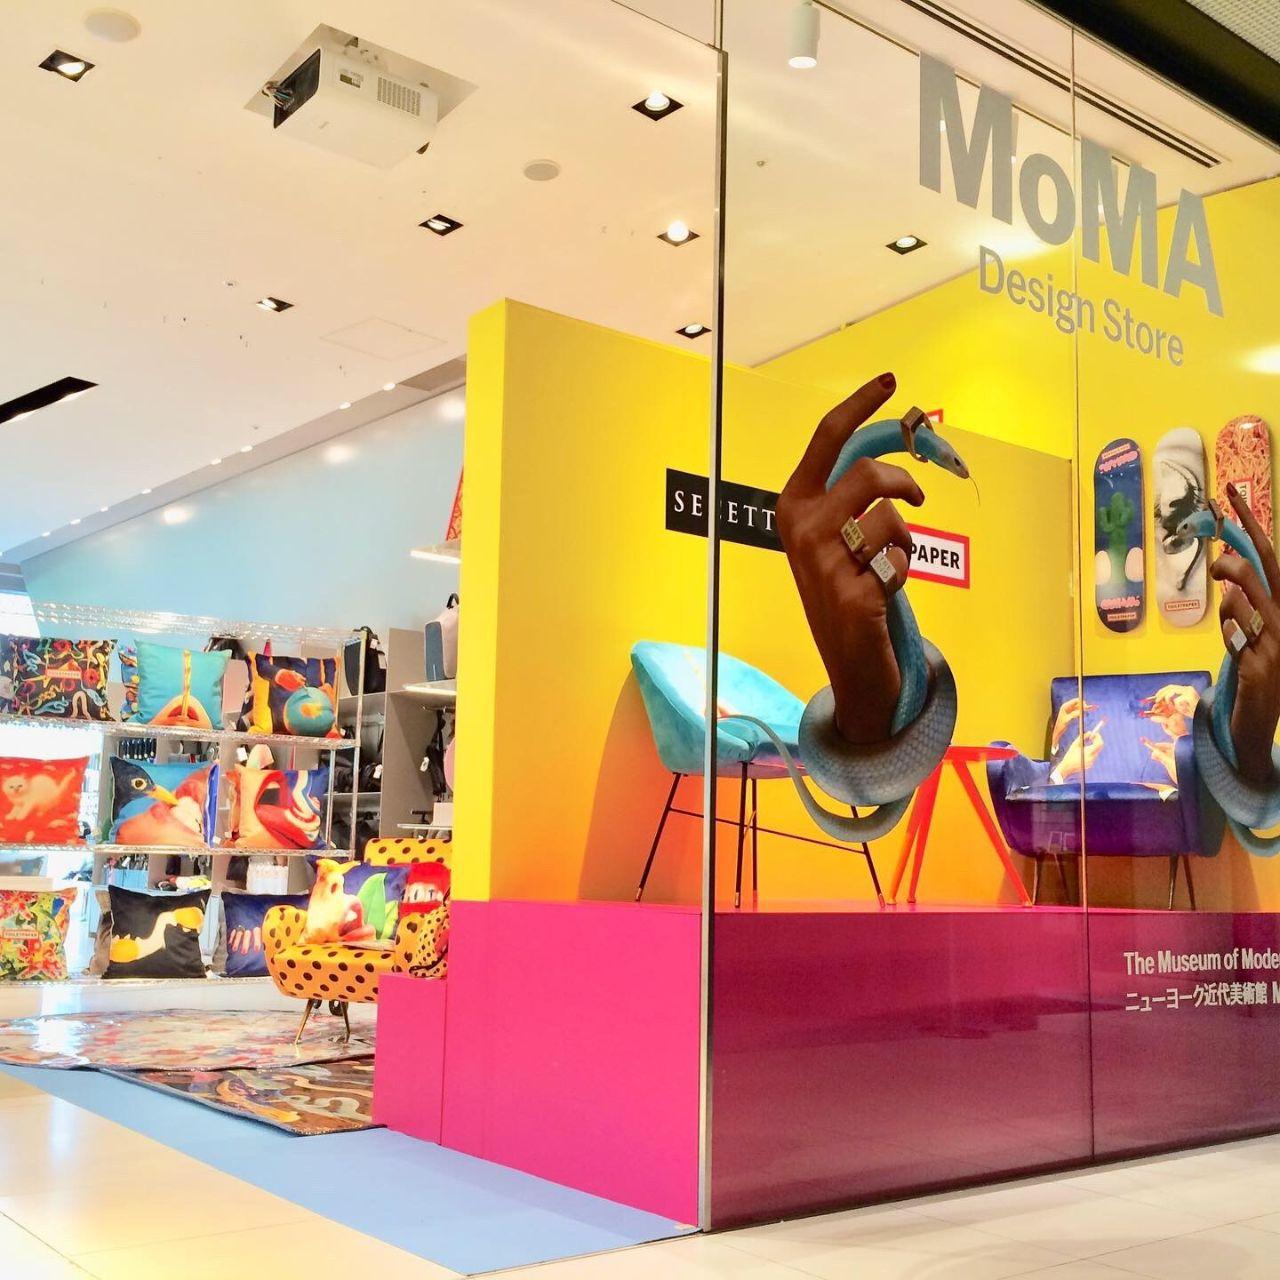 「【MoMA Design Store】Seletti Wears TOILETPAPER」の写真